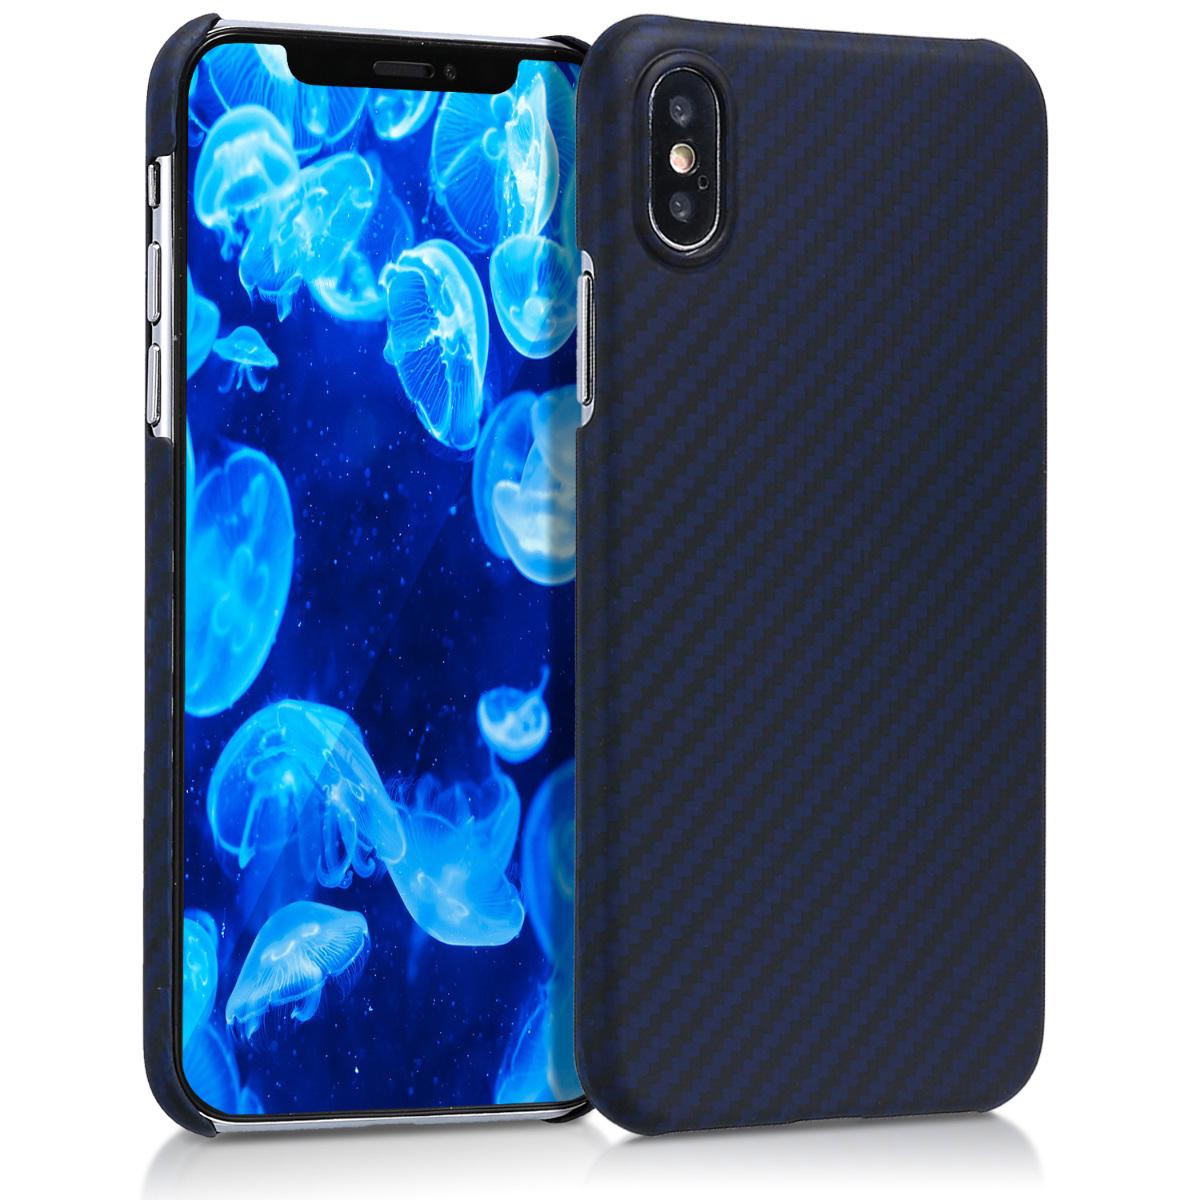 Aramidpouzdro pro Apple iPhone X - Dark Blue Matte